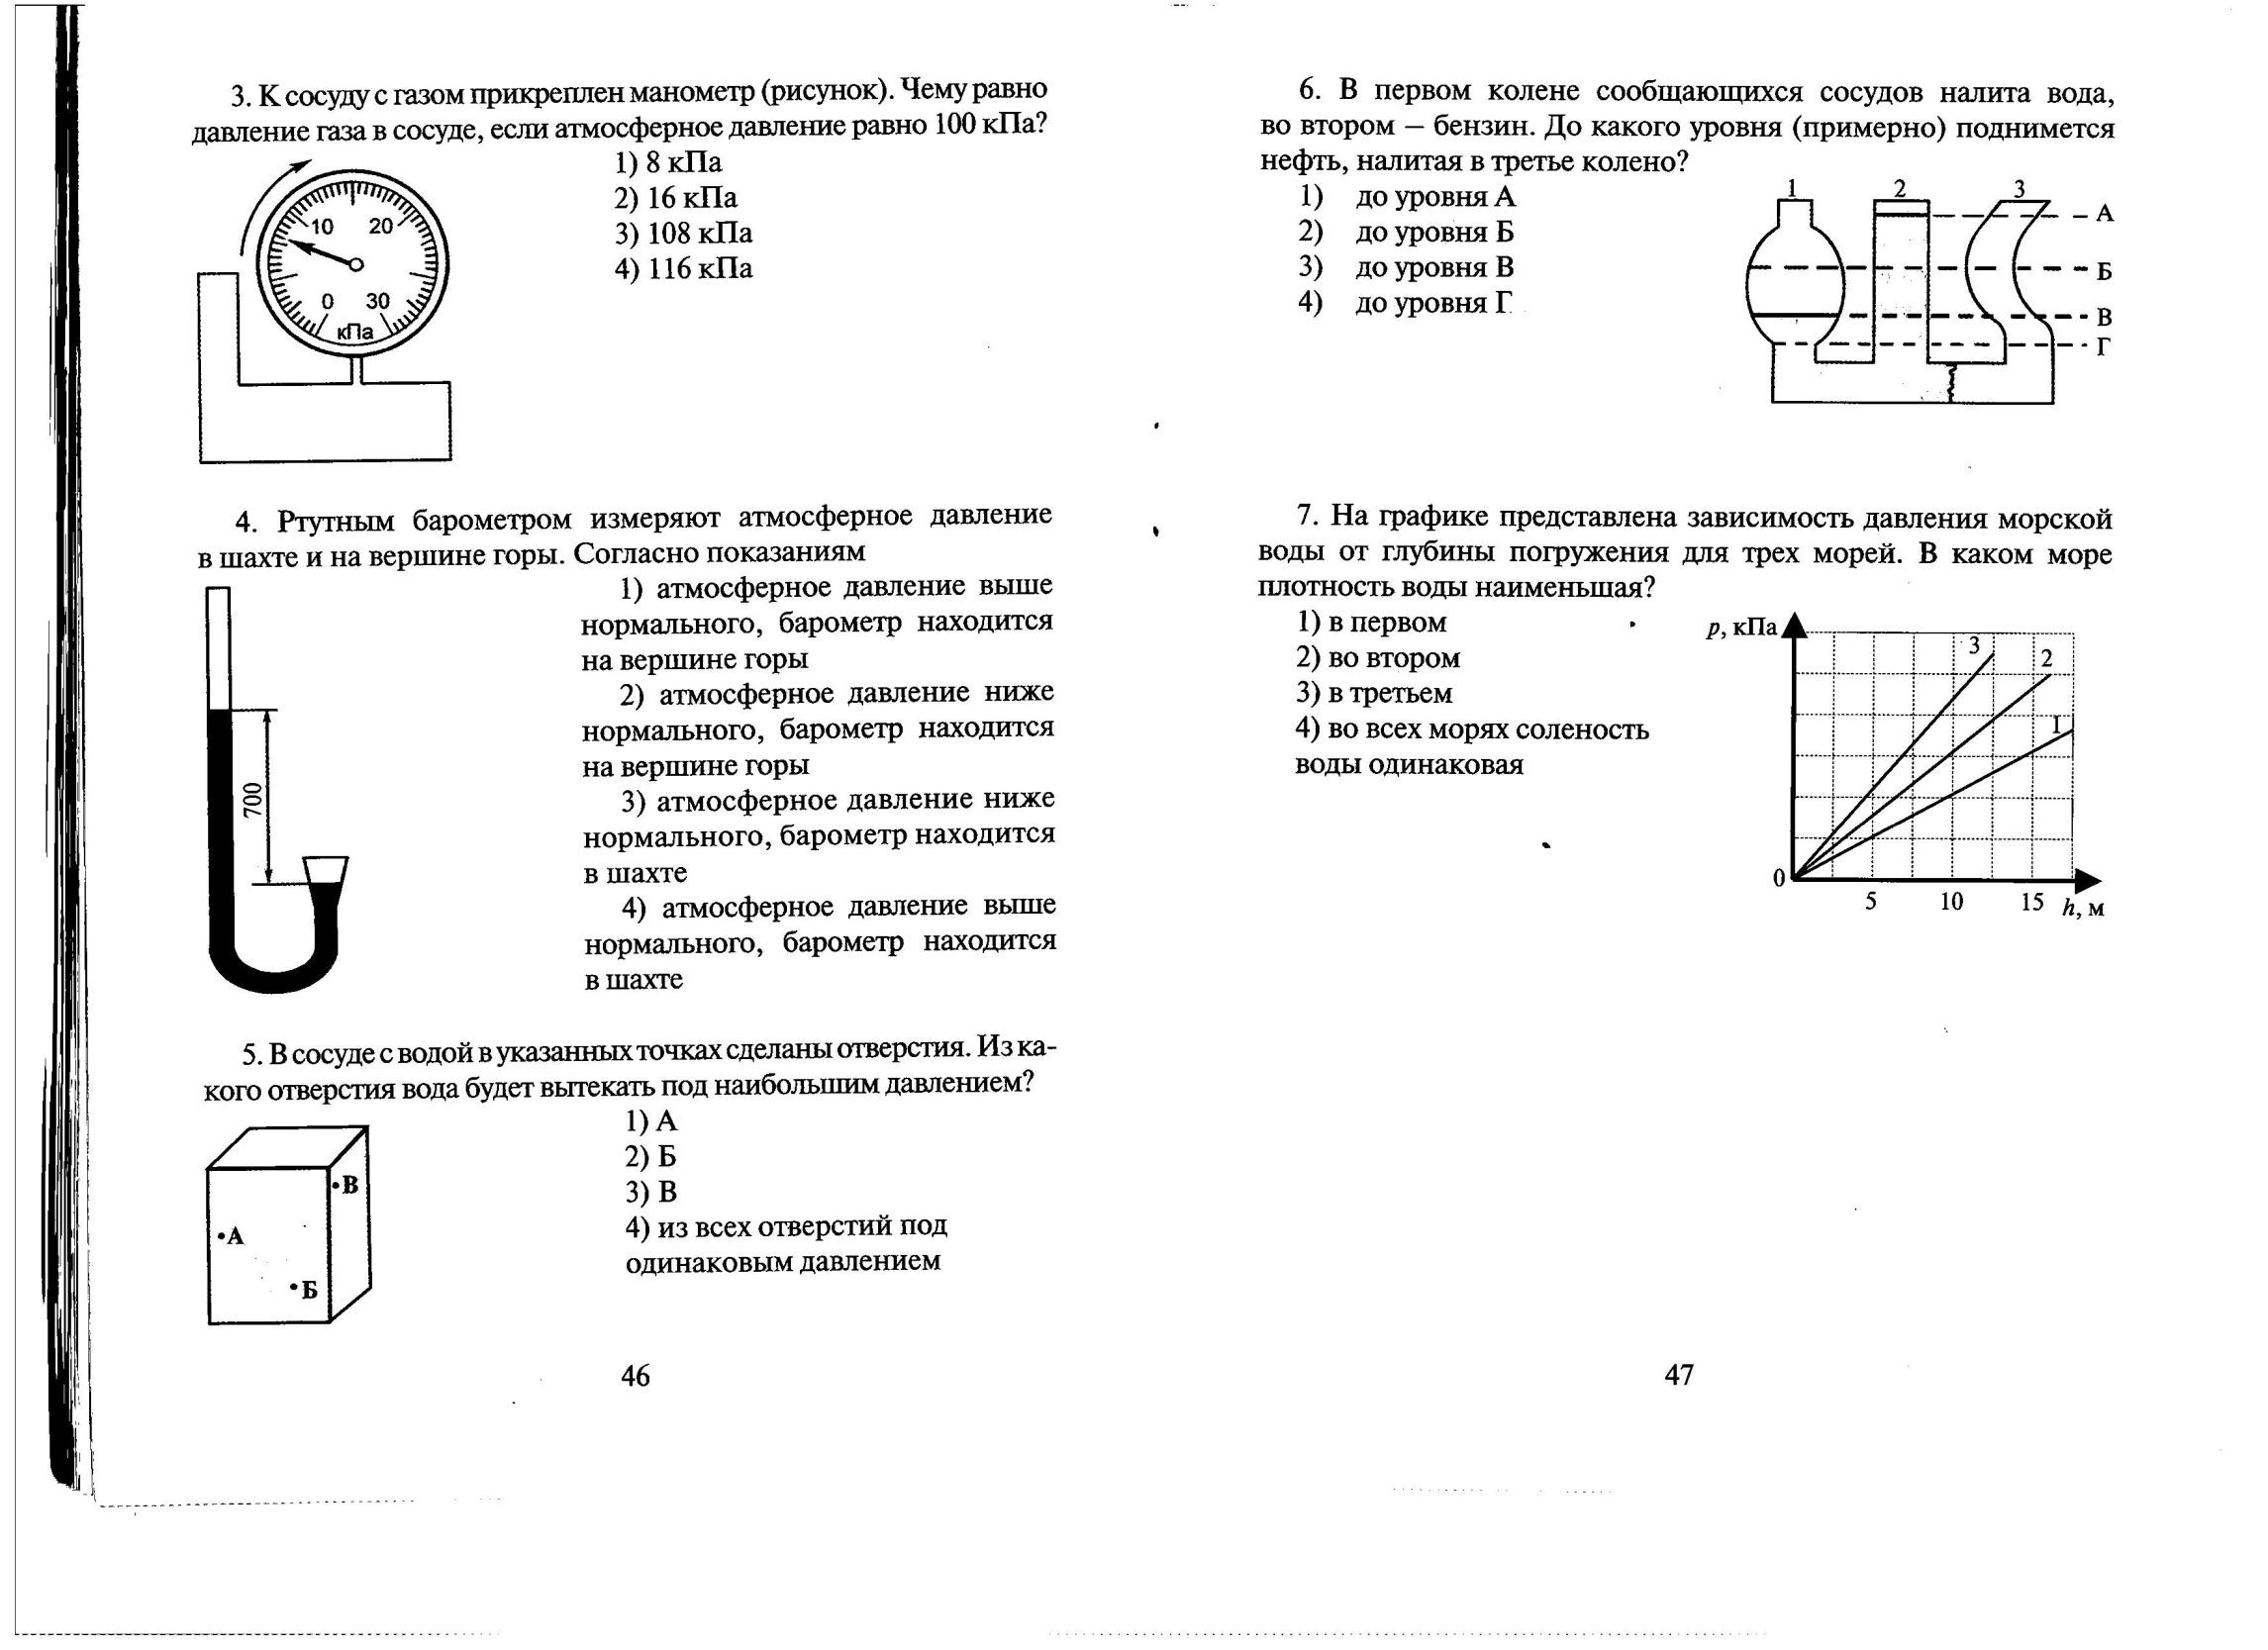 C:\Users\1\Desktop\физика 7 класс кр\19.jpeg